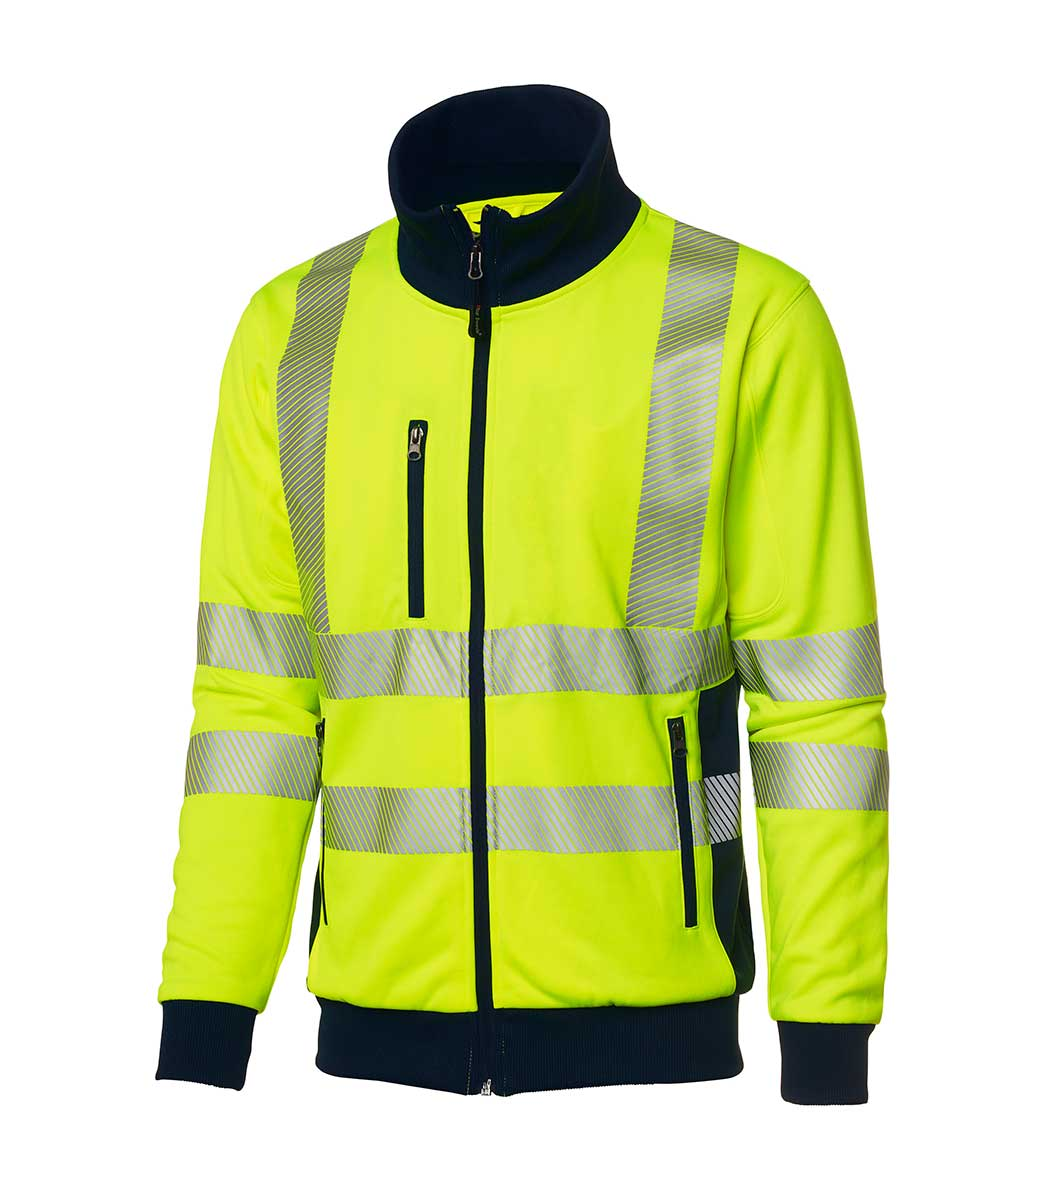 0741df0f Gul jakke med 3M refleksbånd ~ Ezzenza.no Arbeidsklær